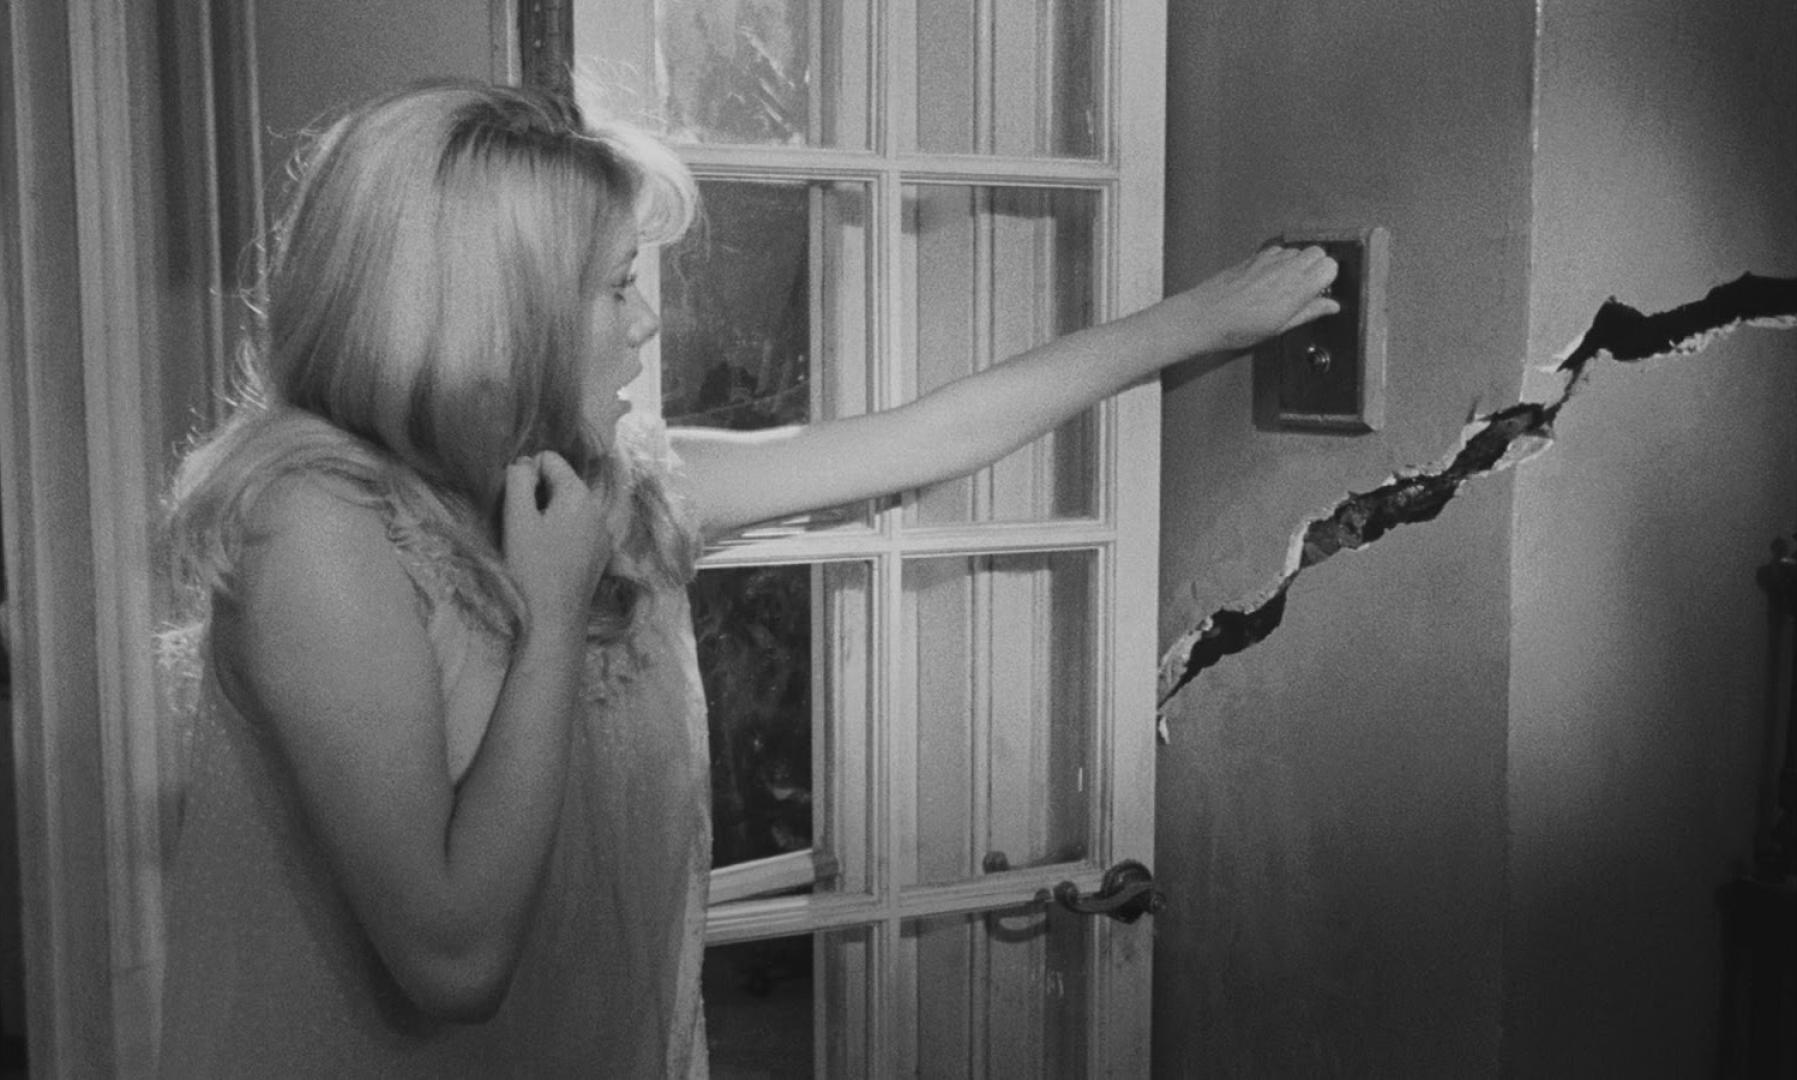 Repulsion - Iszonyat (1965)